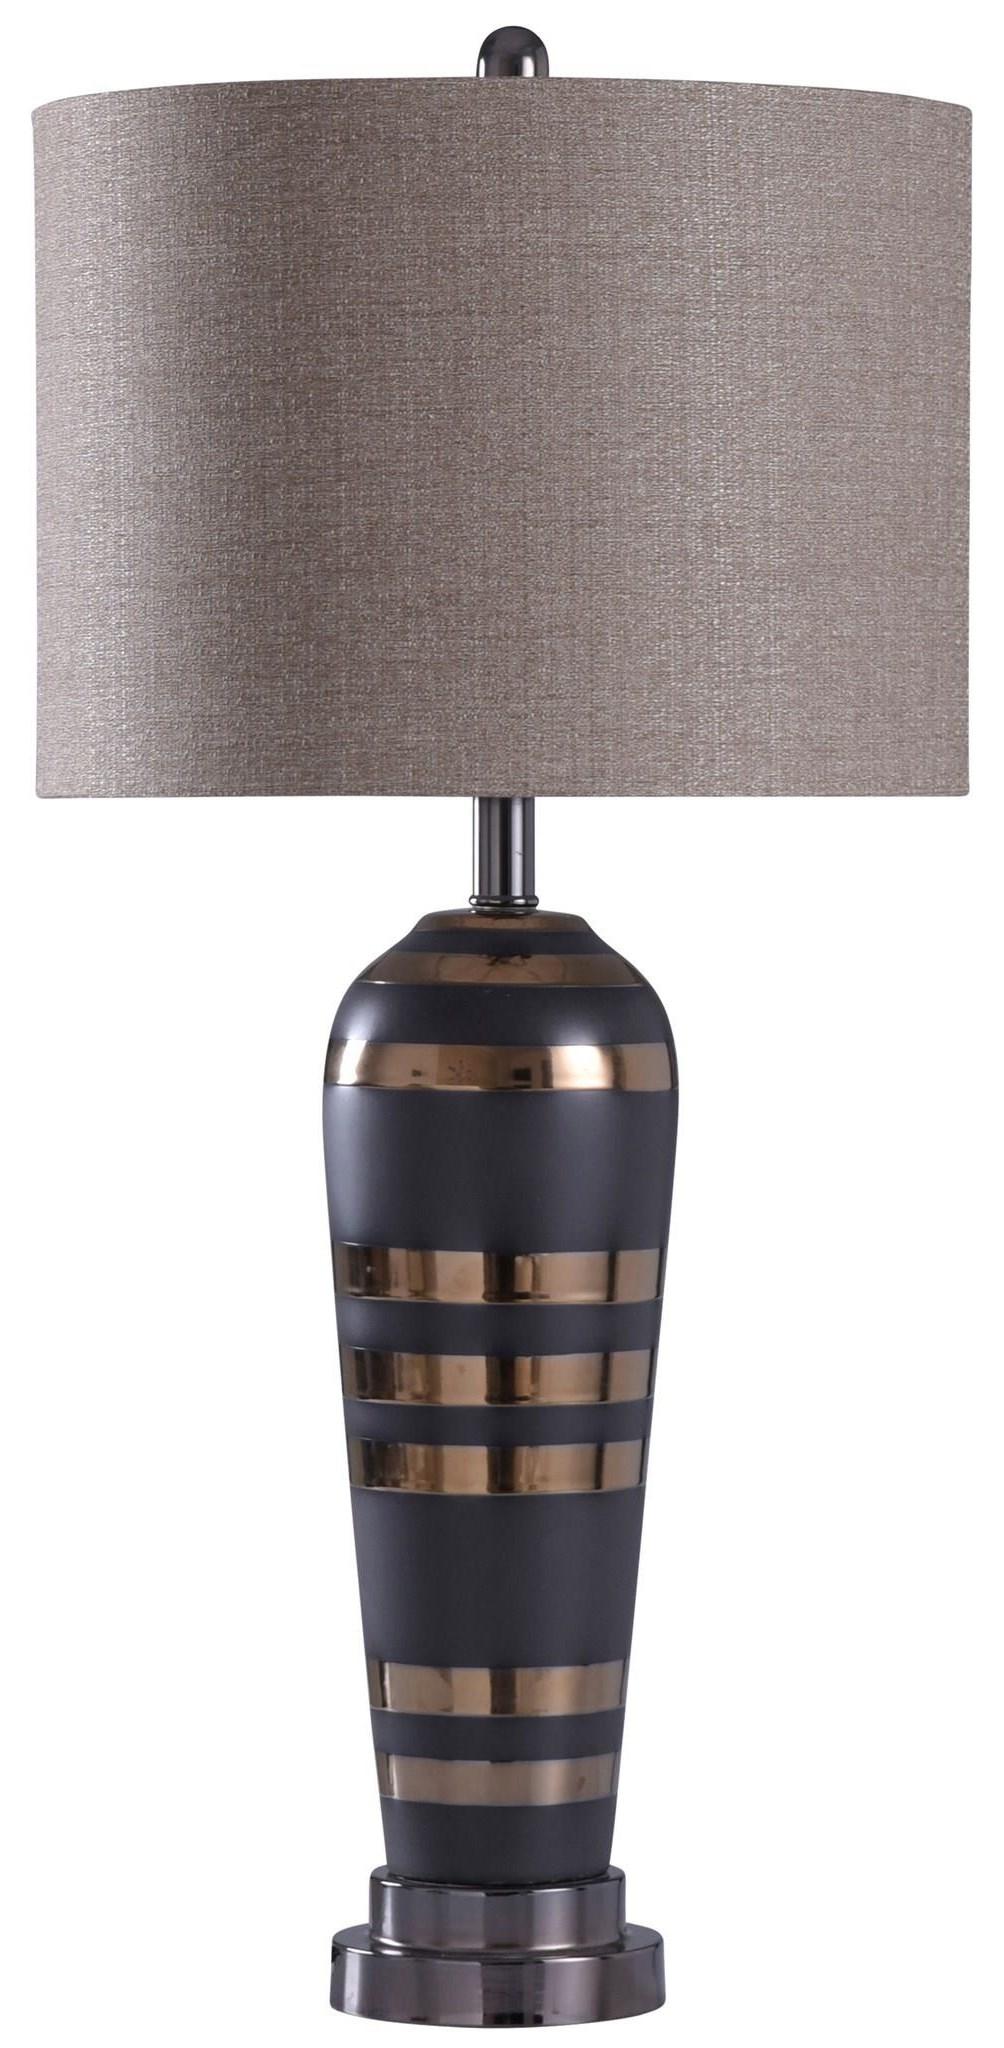 Lamps BRUSHED LAMP by StyleCraft at Furniture Fair - North Carolina